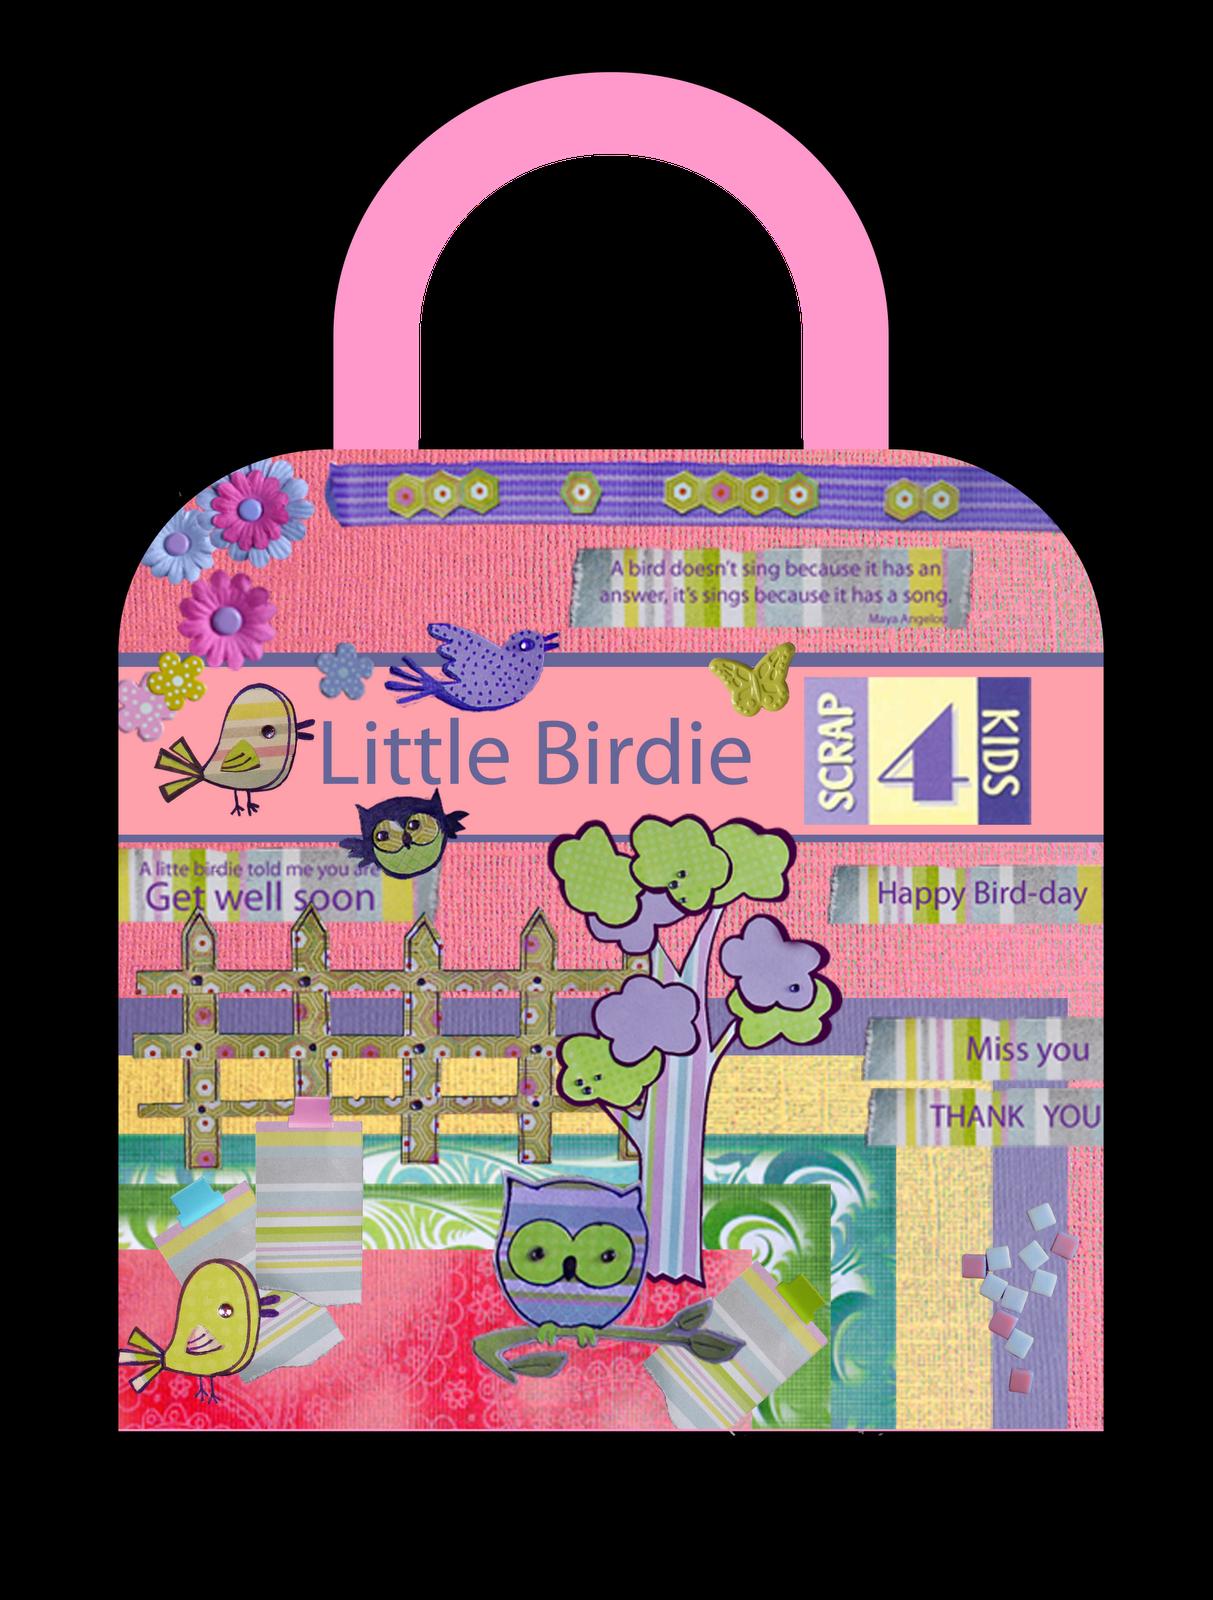 birdies free download free pc download games